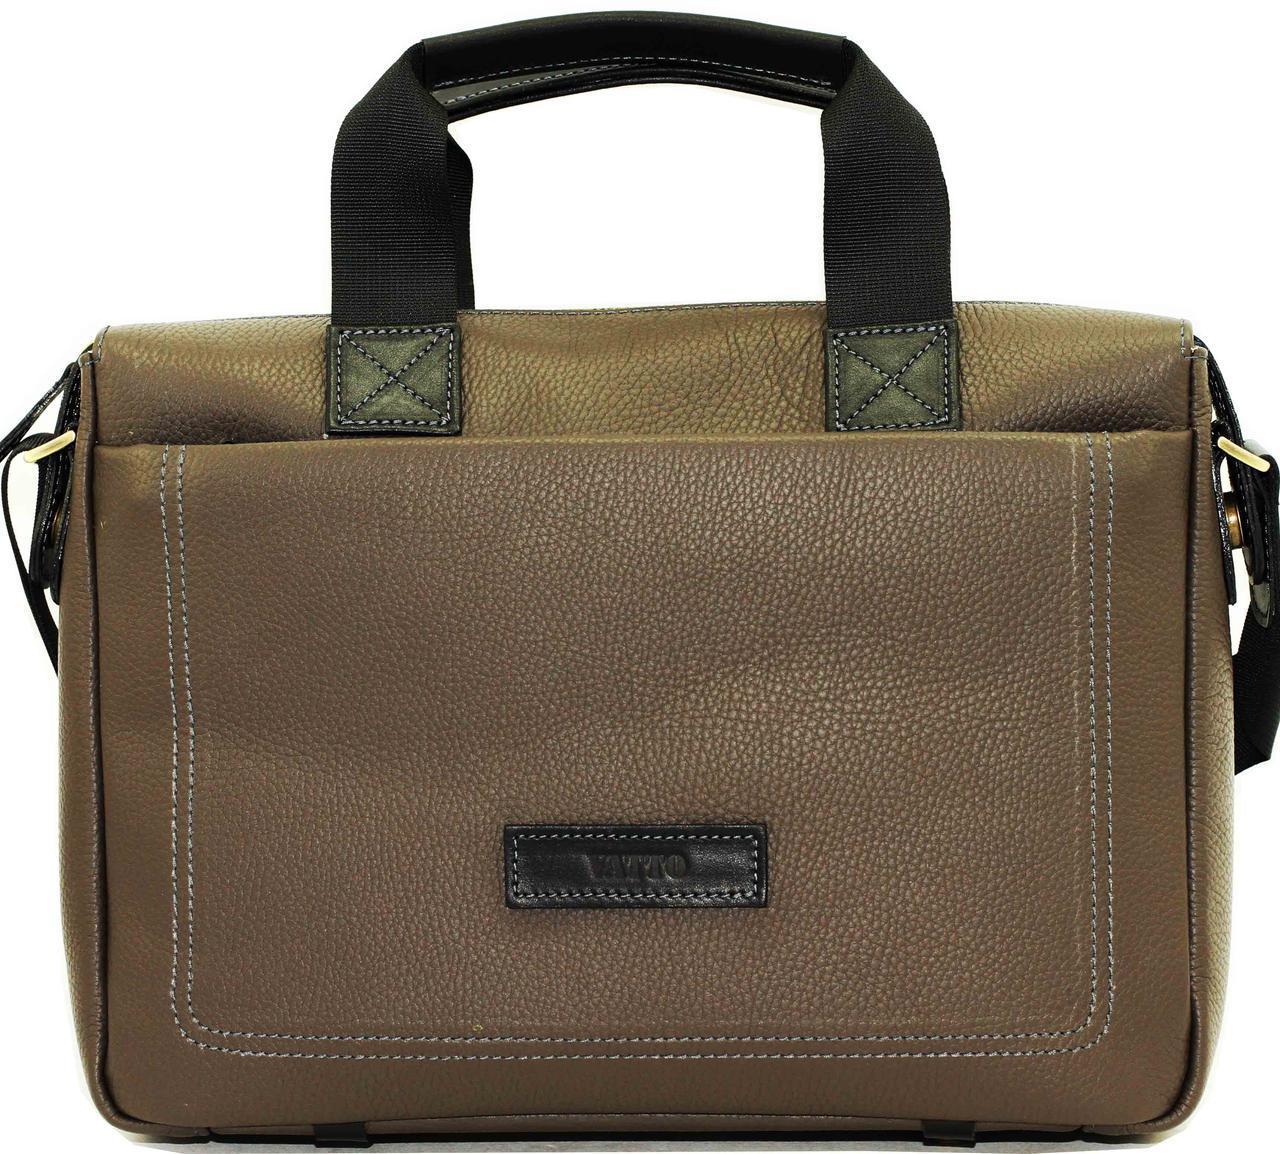 Мужская сумка VATTO Mk33.1 F13Kаz1